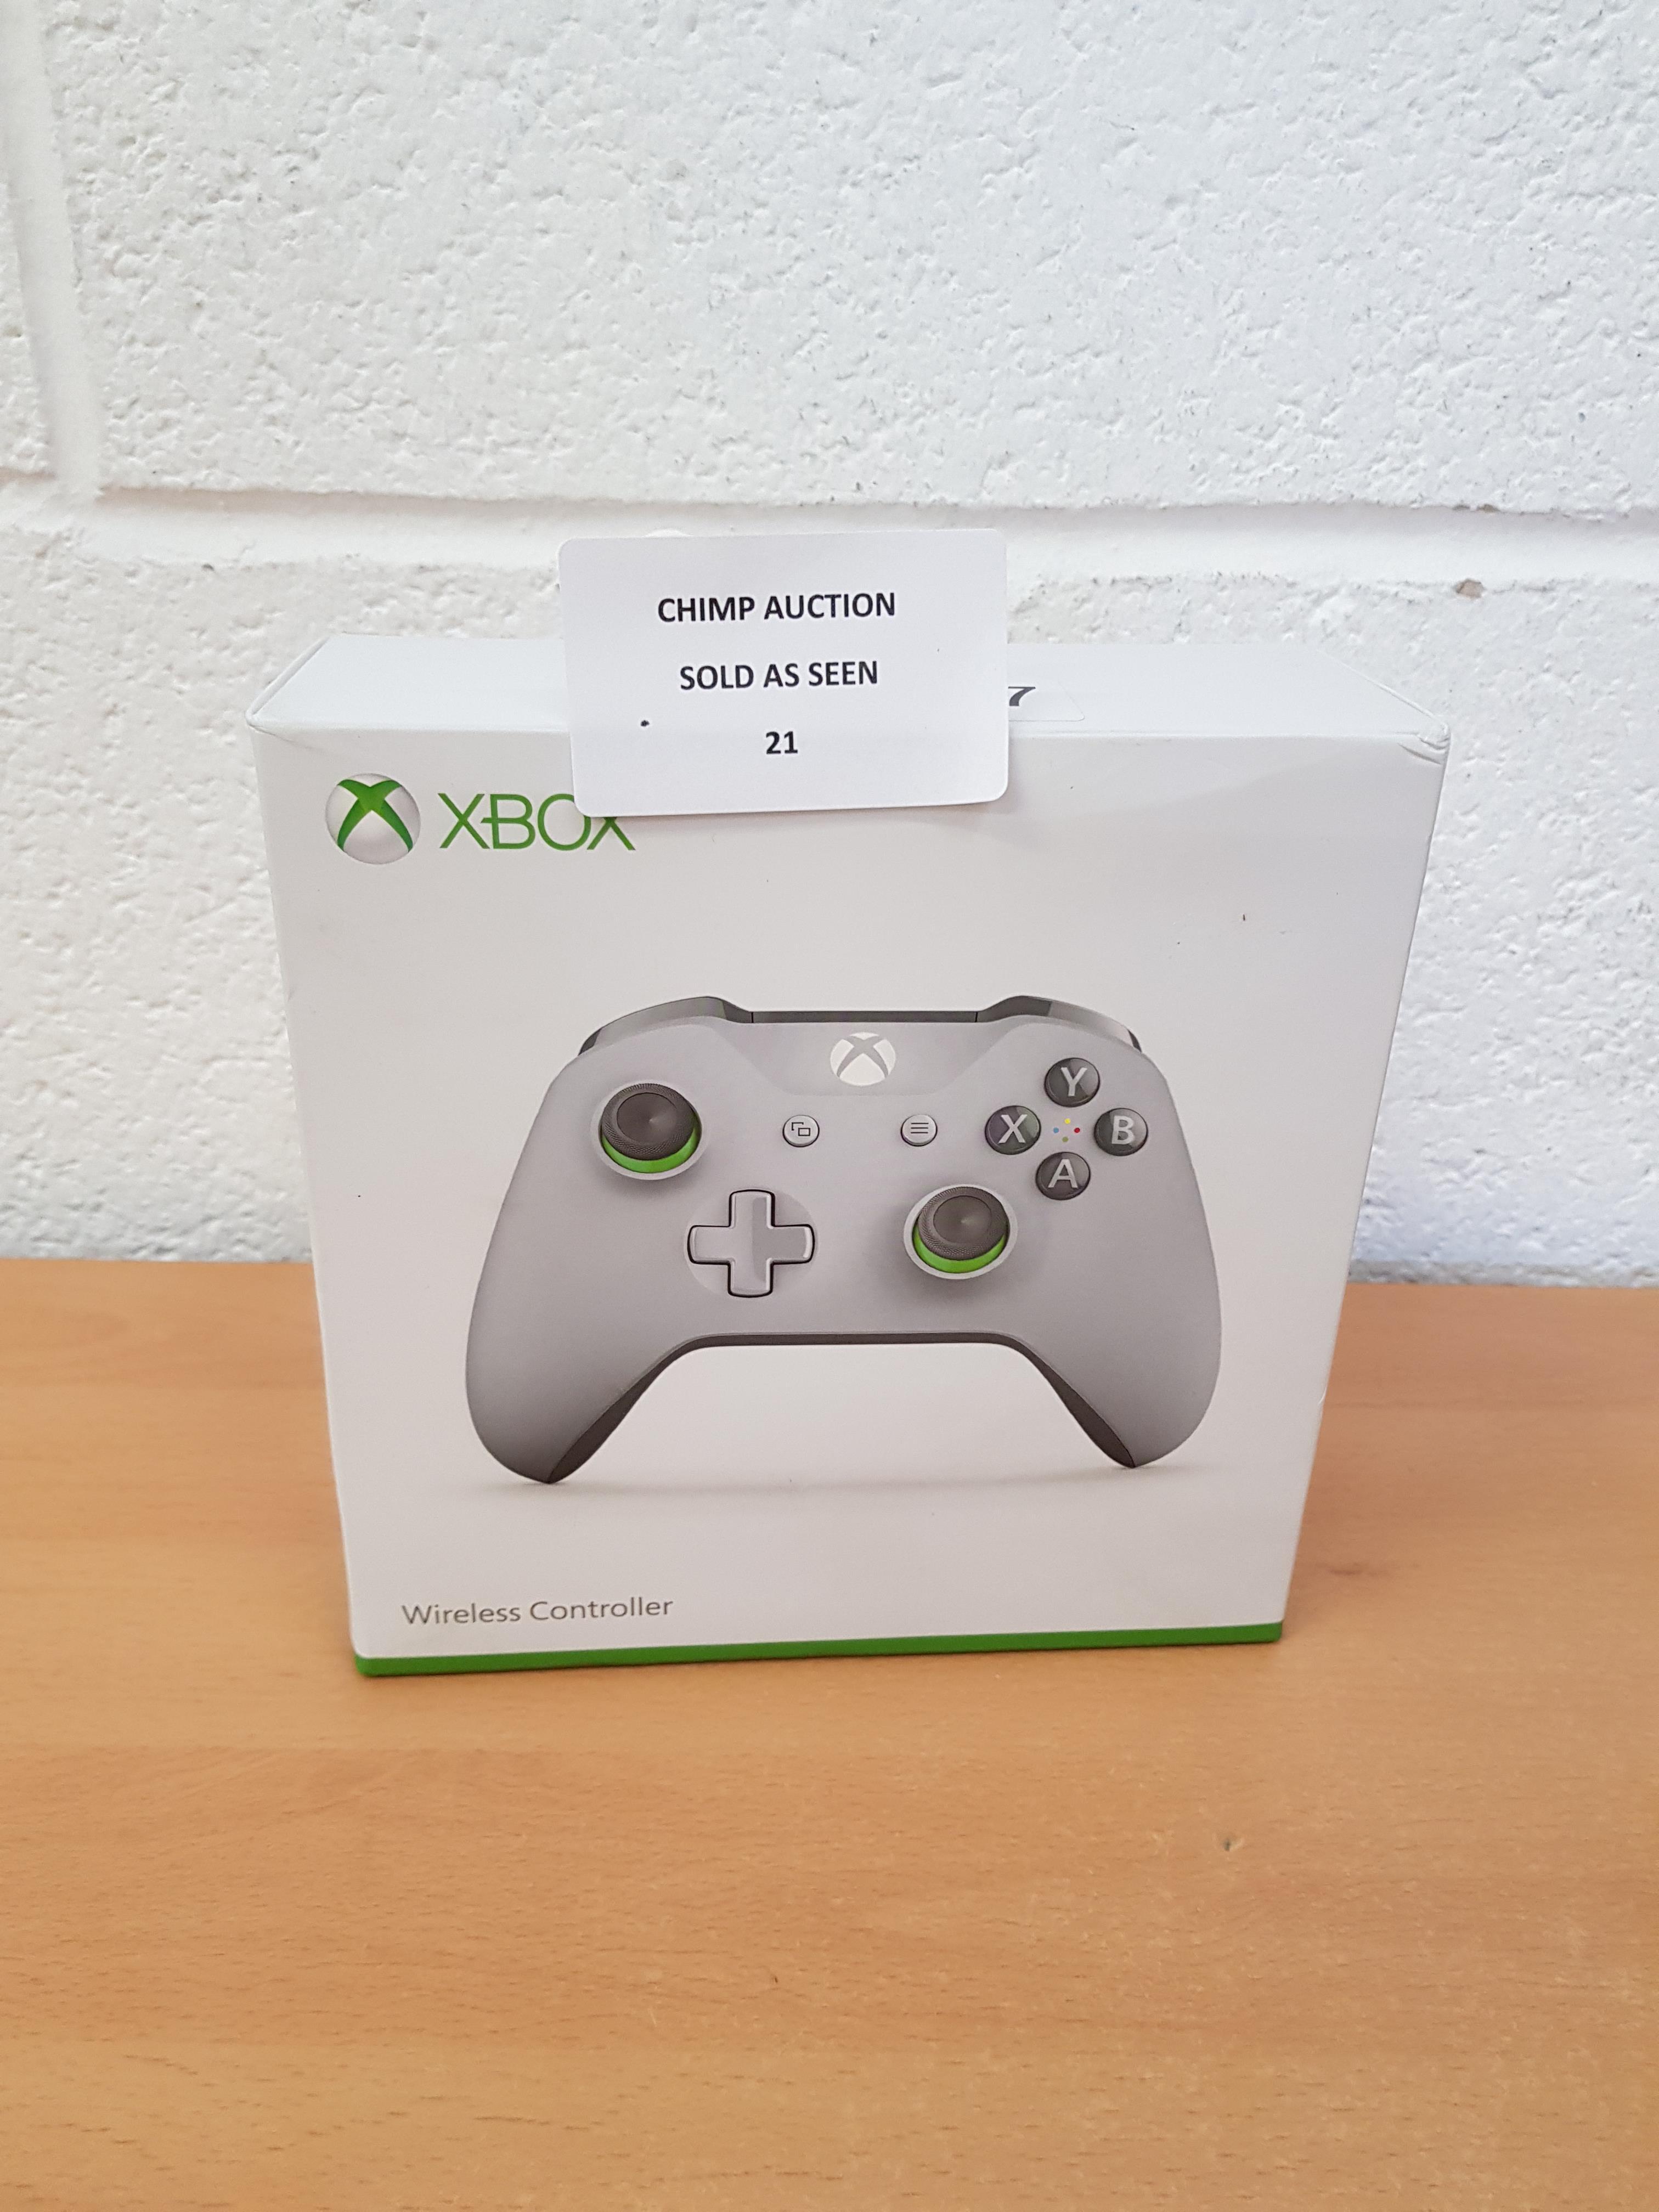 Lot 21 - Microsoft Xbox One Wireless Controller RP £59.99